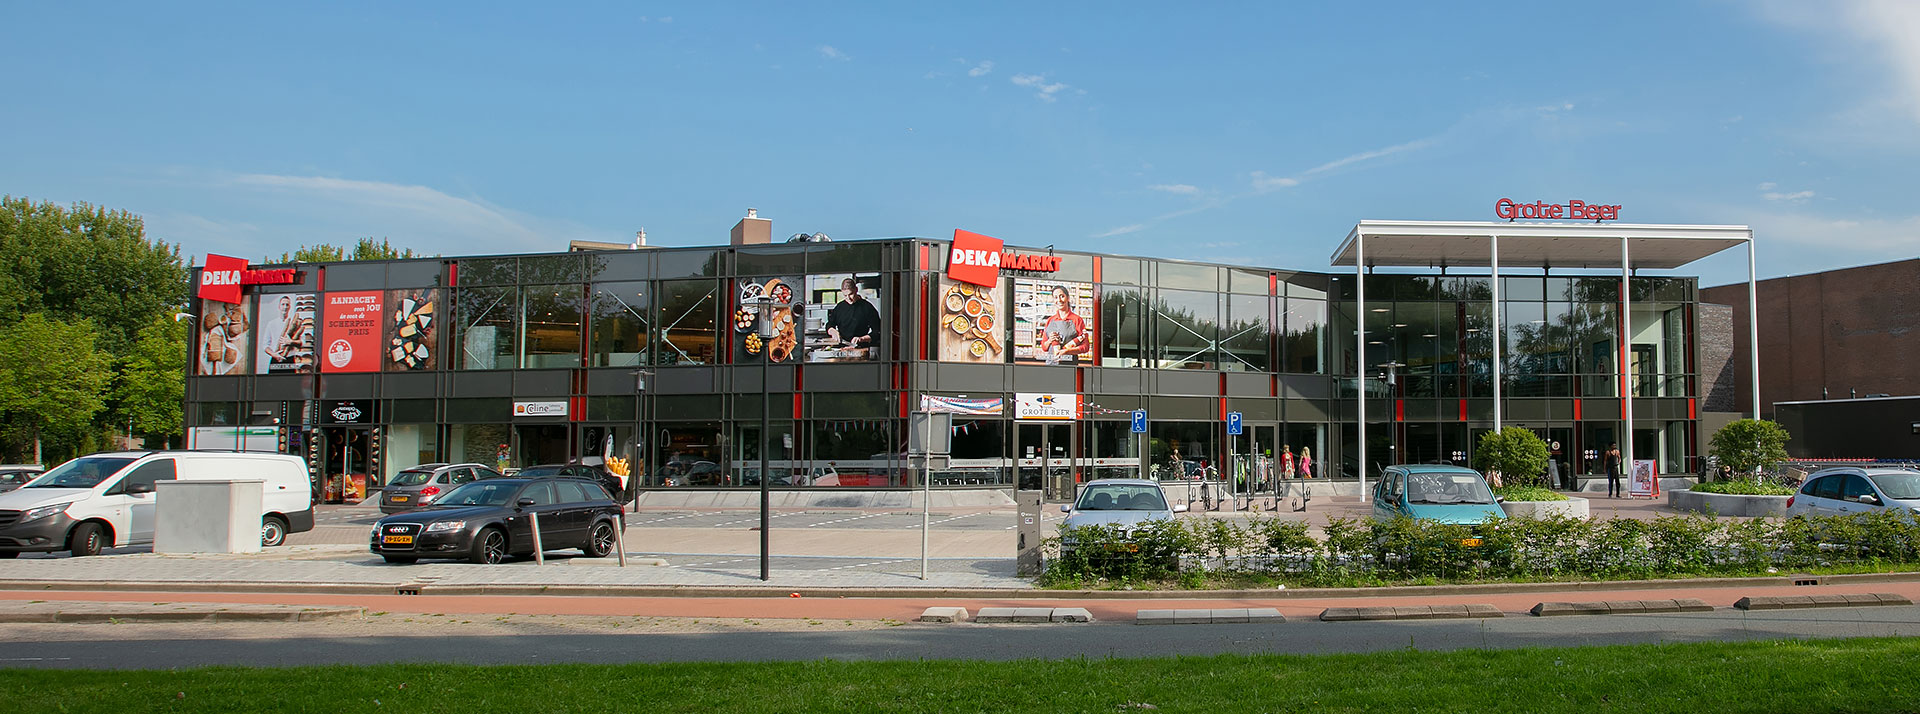 Winkelcentrum Grote Beer Hoorn